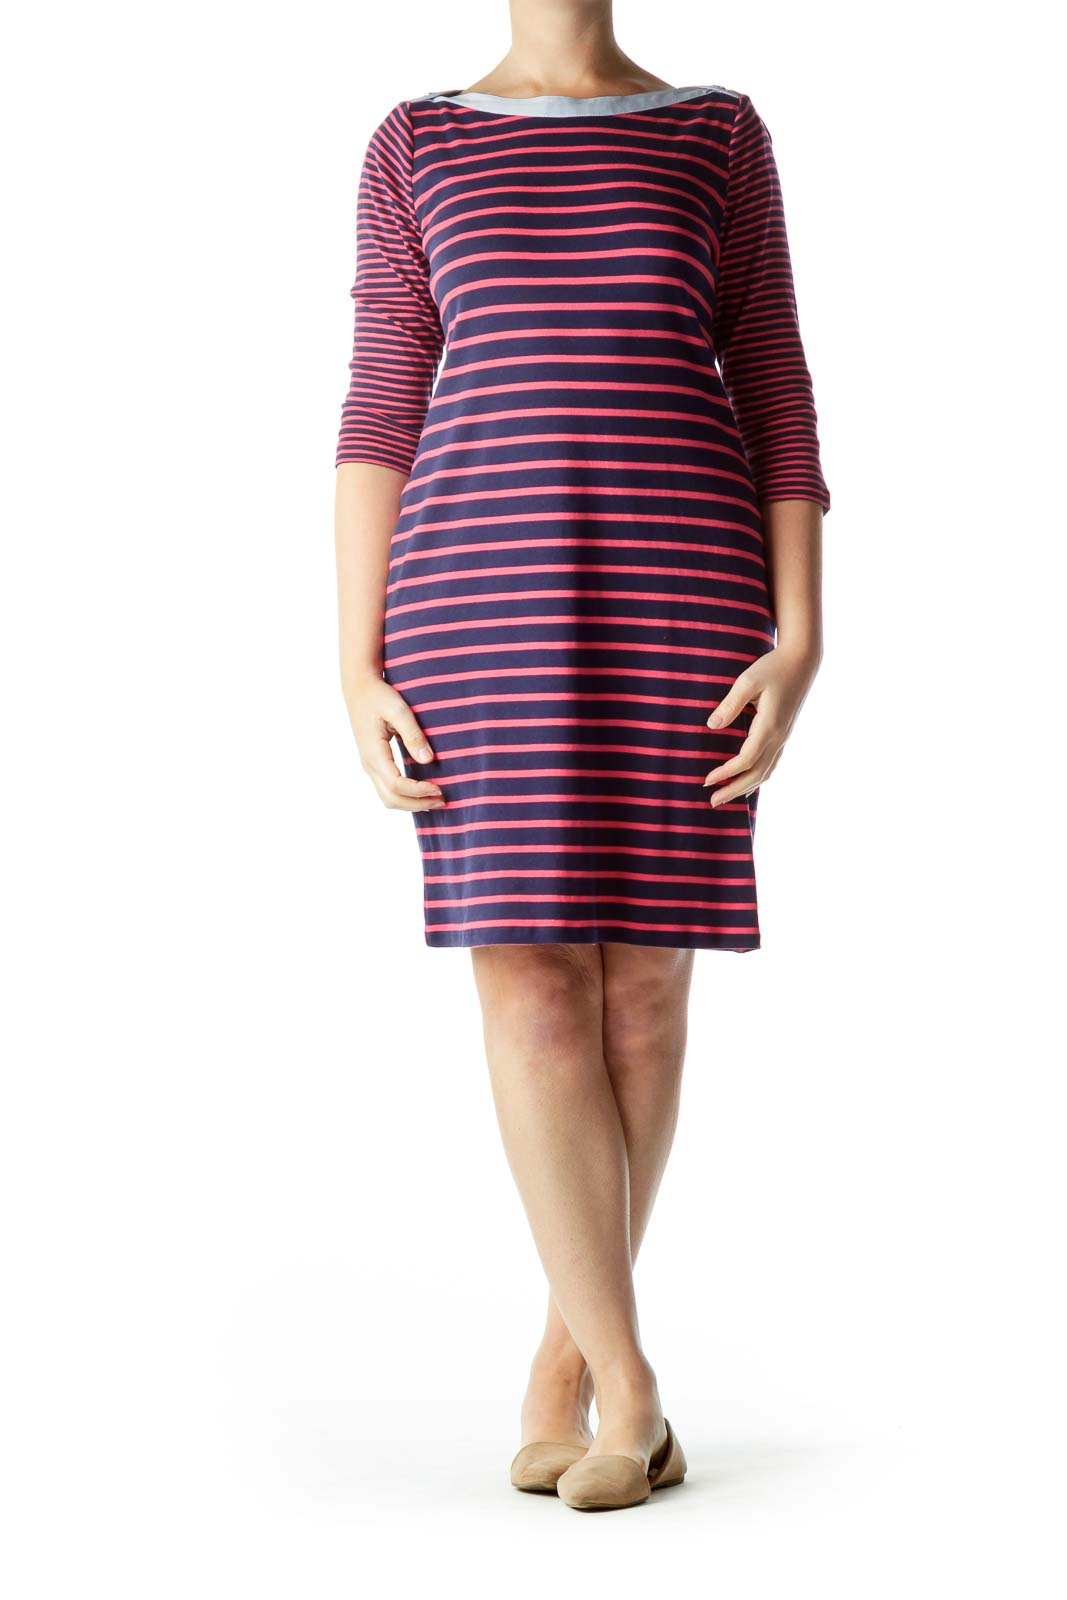 Navy Striped Cotton Dress